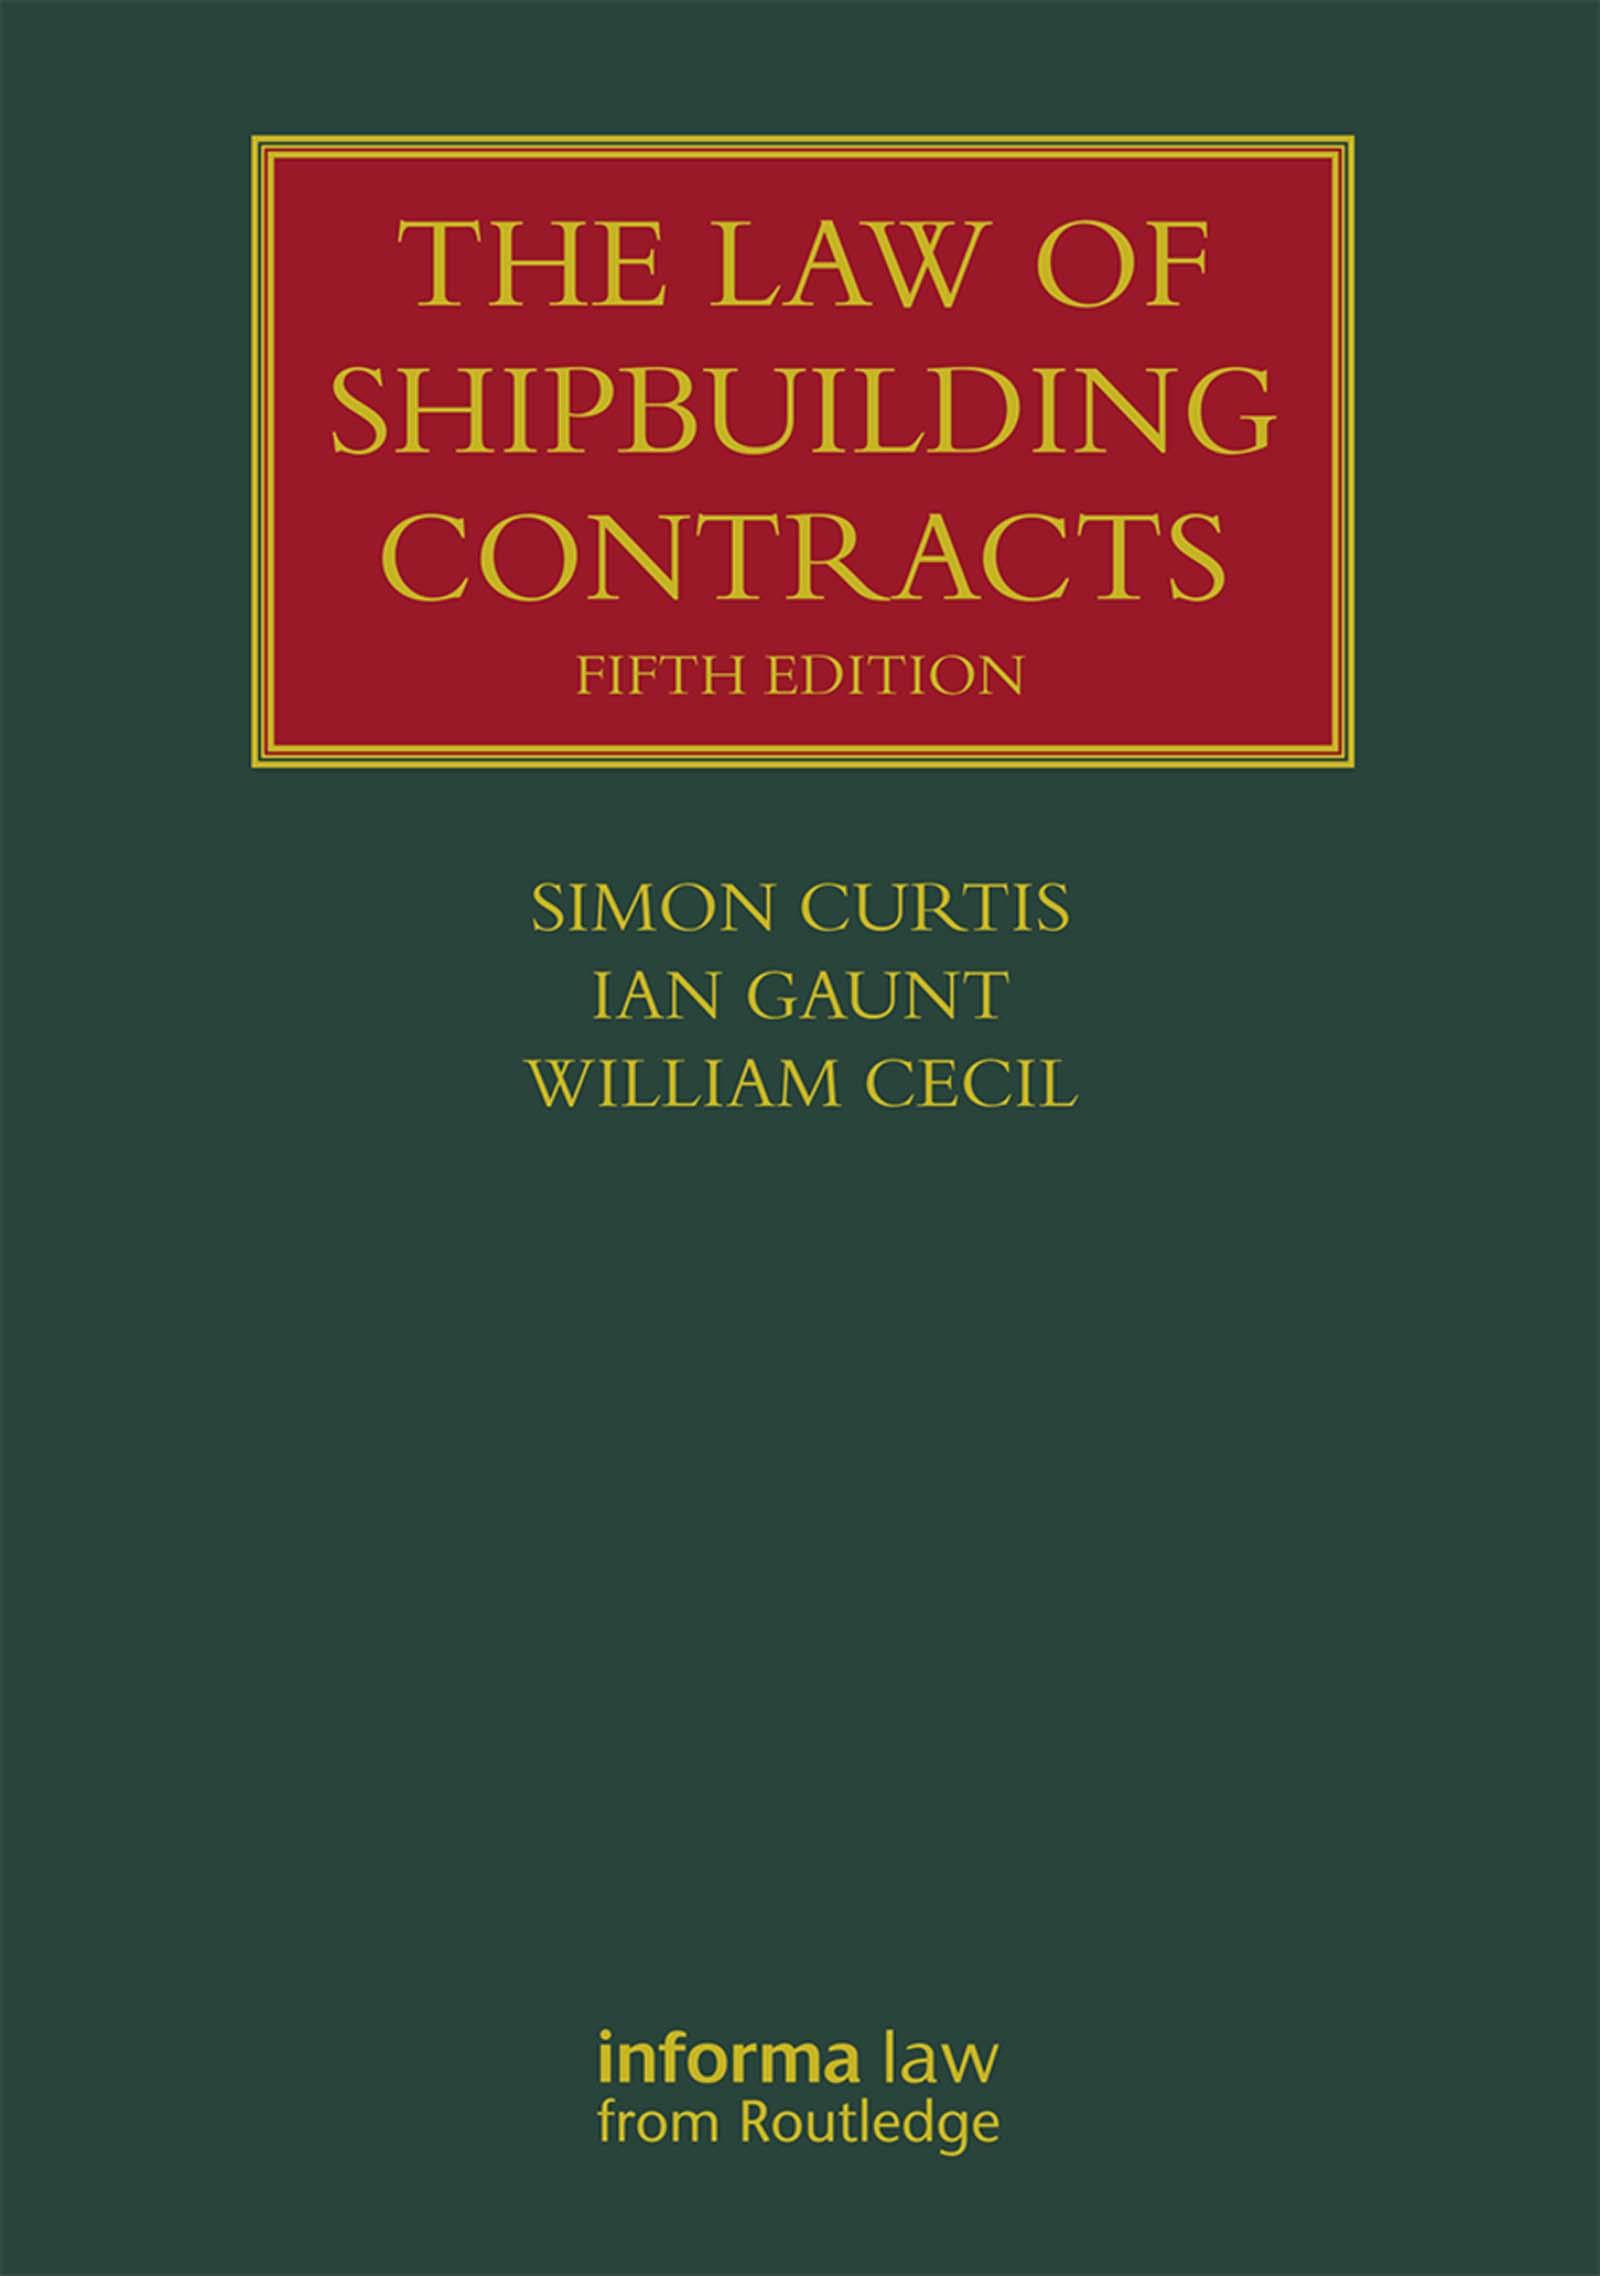 Article III—Adjustment of Contract Price